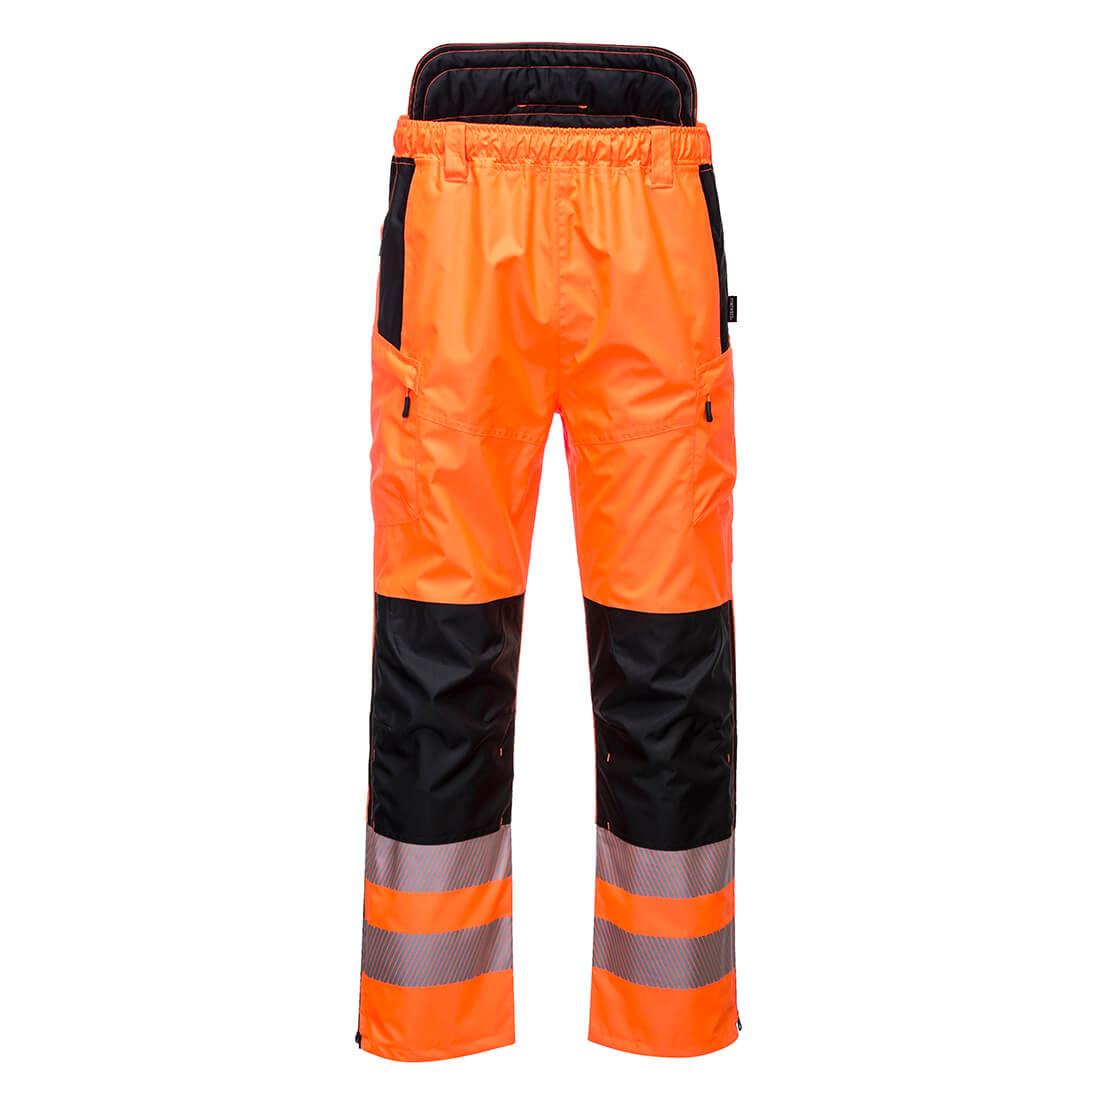 PW3 Hi-Vis Extreme Trousers Orange/Black XLR